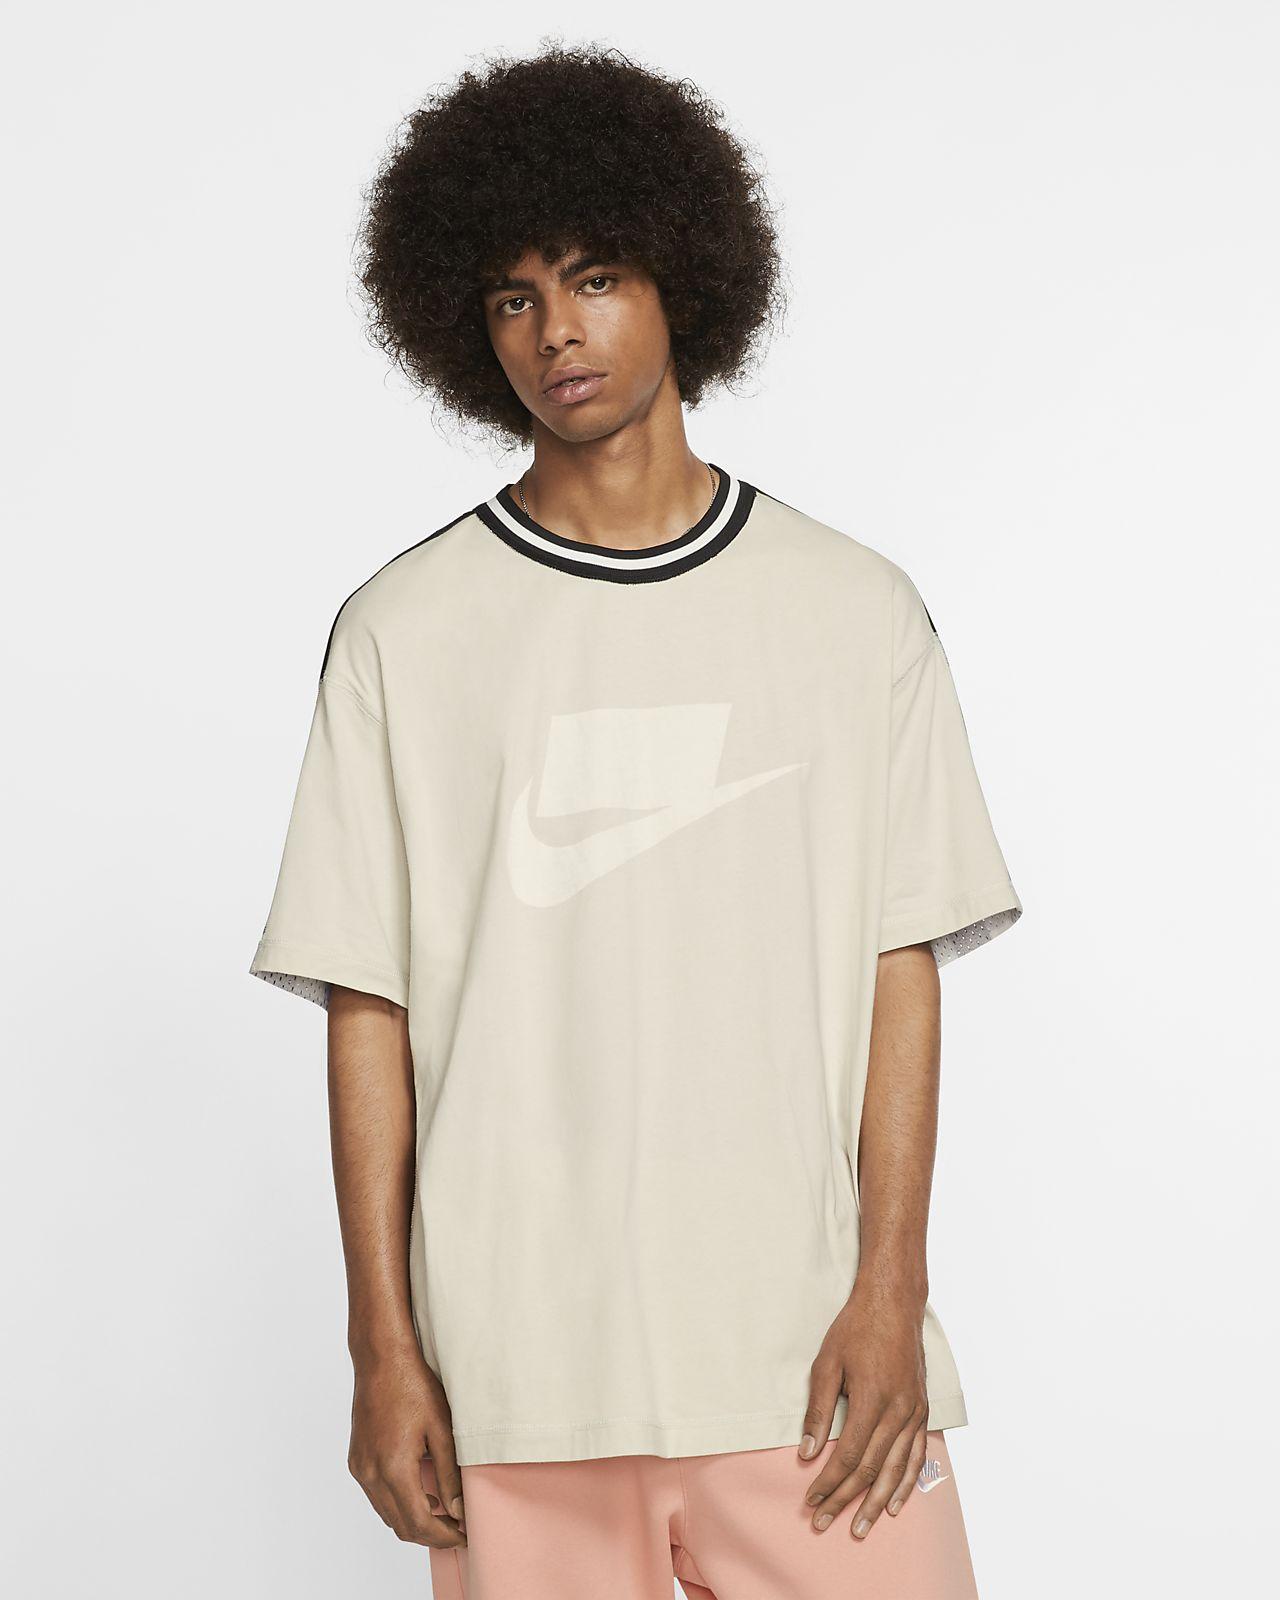 Prenda para la parte superior de manga corta para hombre Nike Sportswear NSW